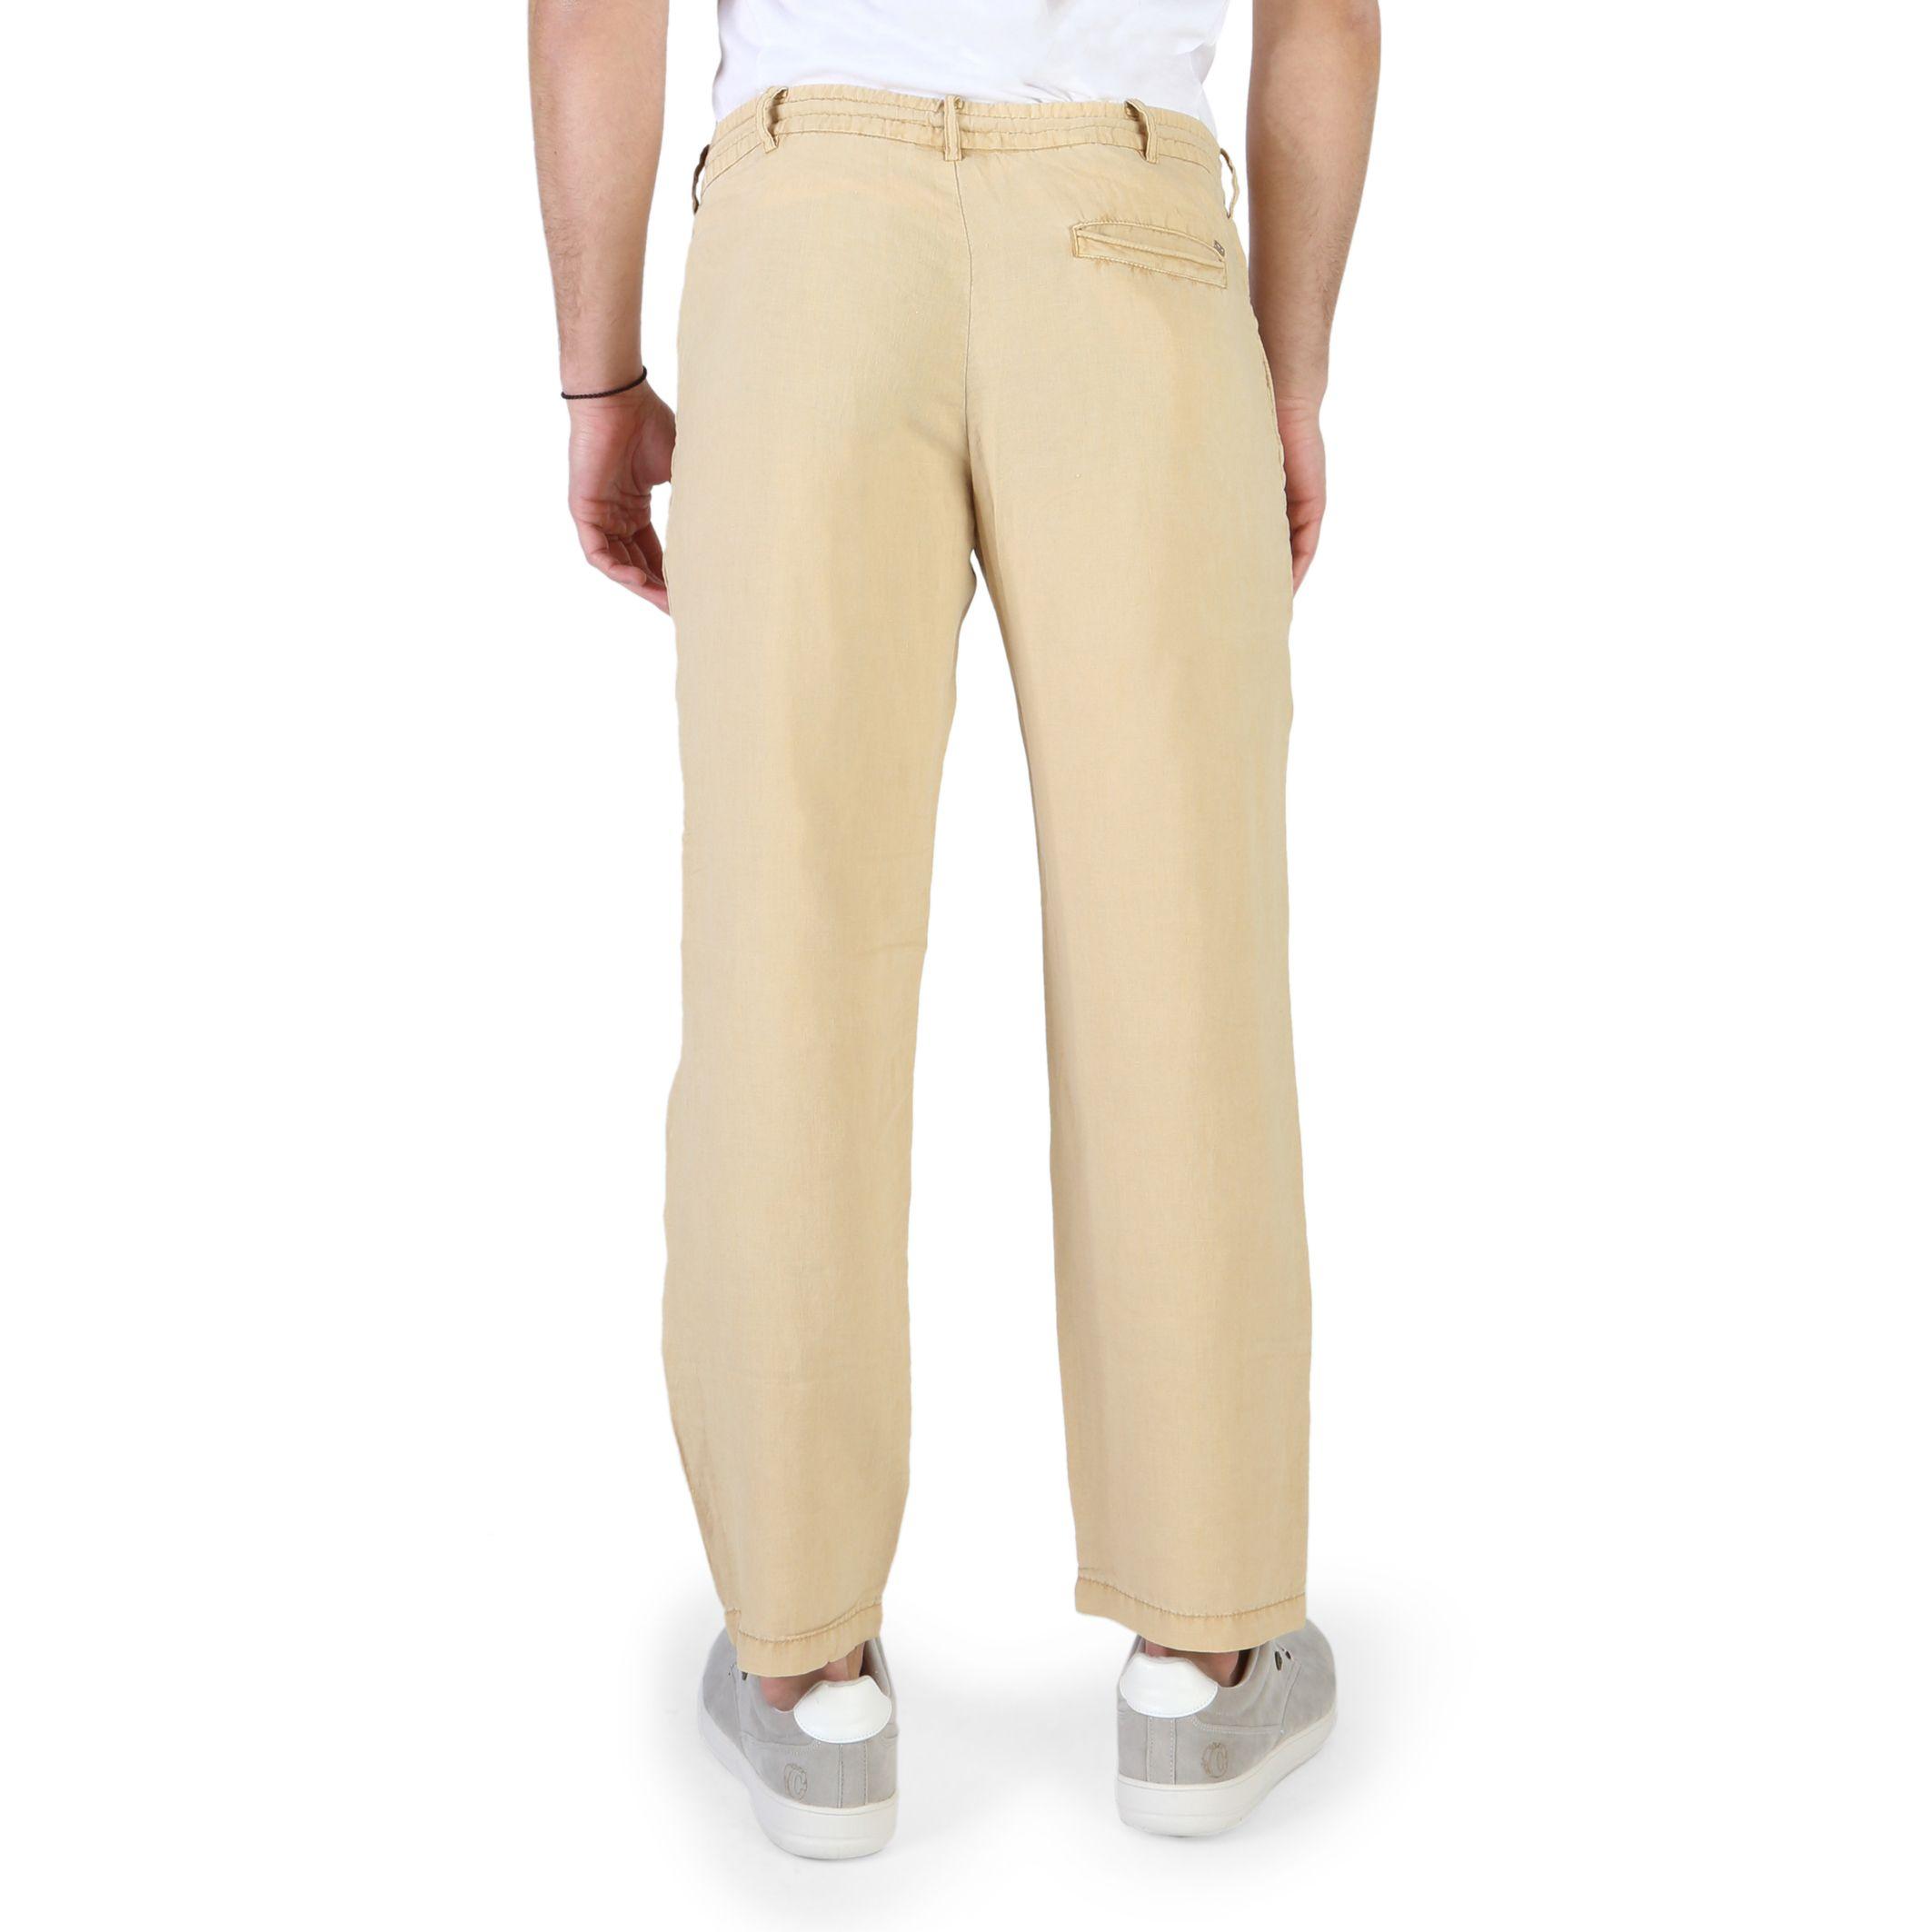 Armani Jeans Mens Trousers